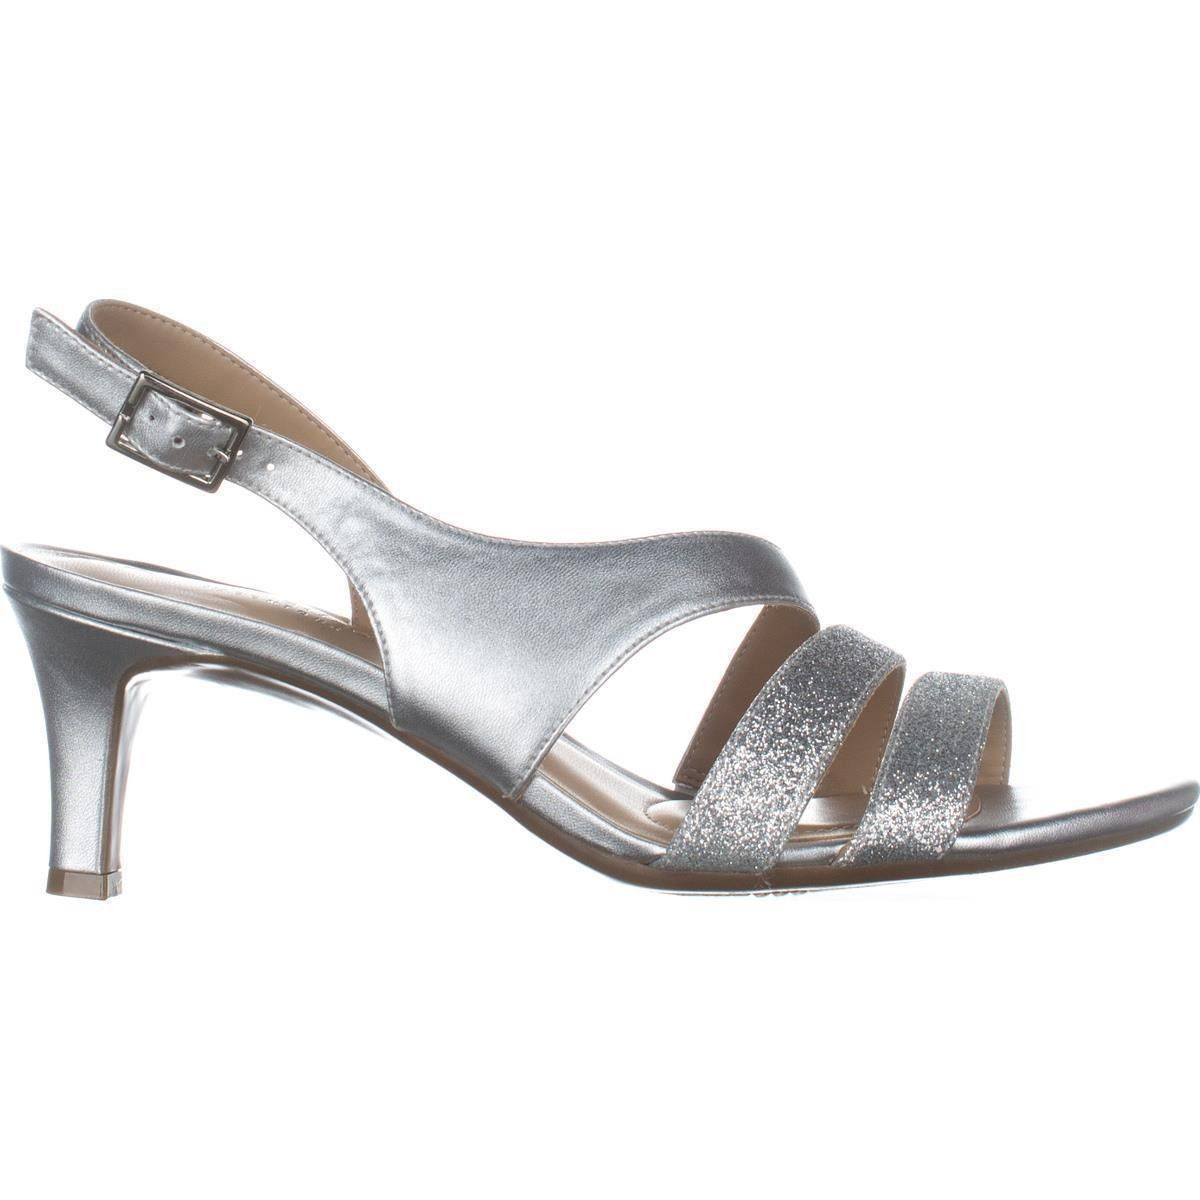 429f79e4b999 naturalizer Taimi Comfort Dress Sandals